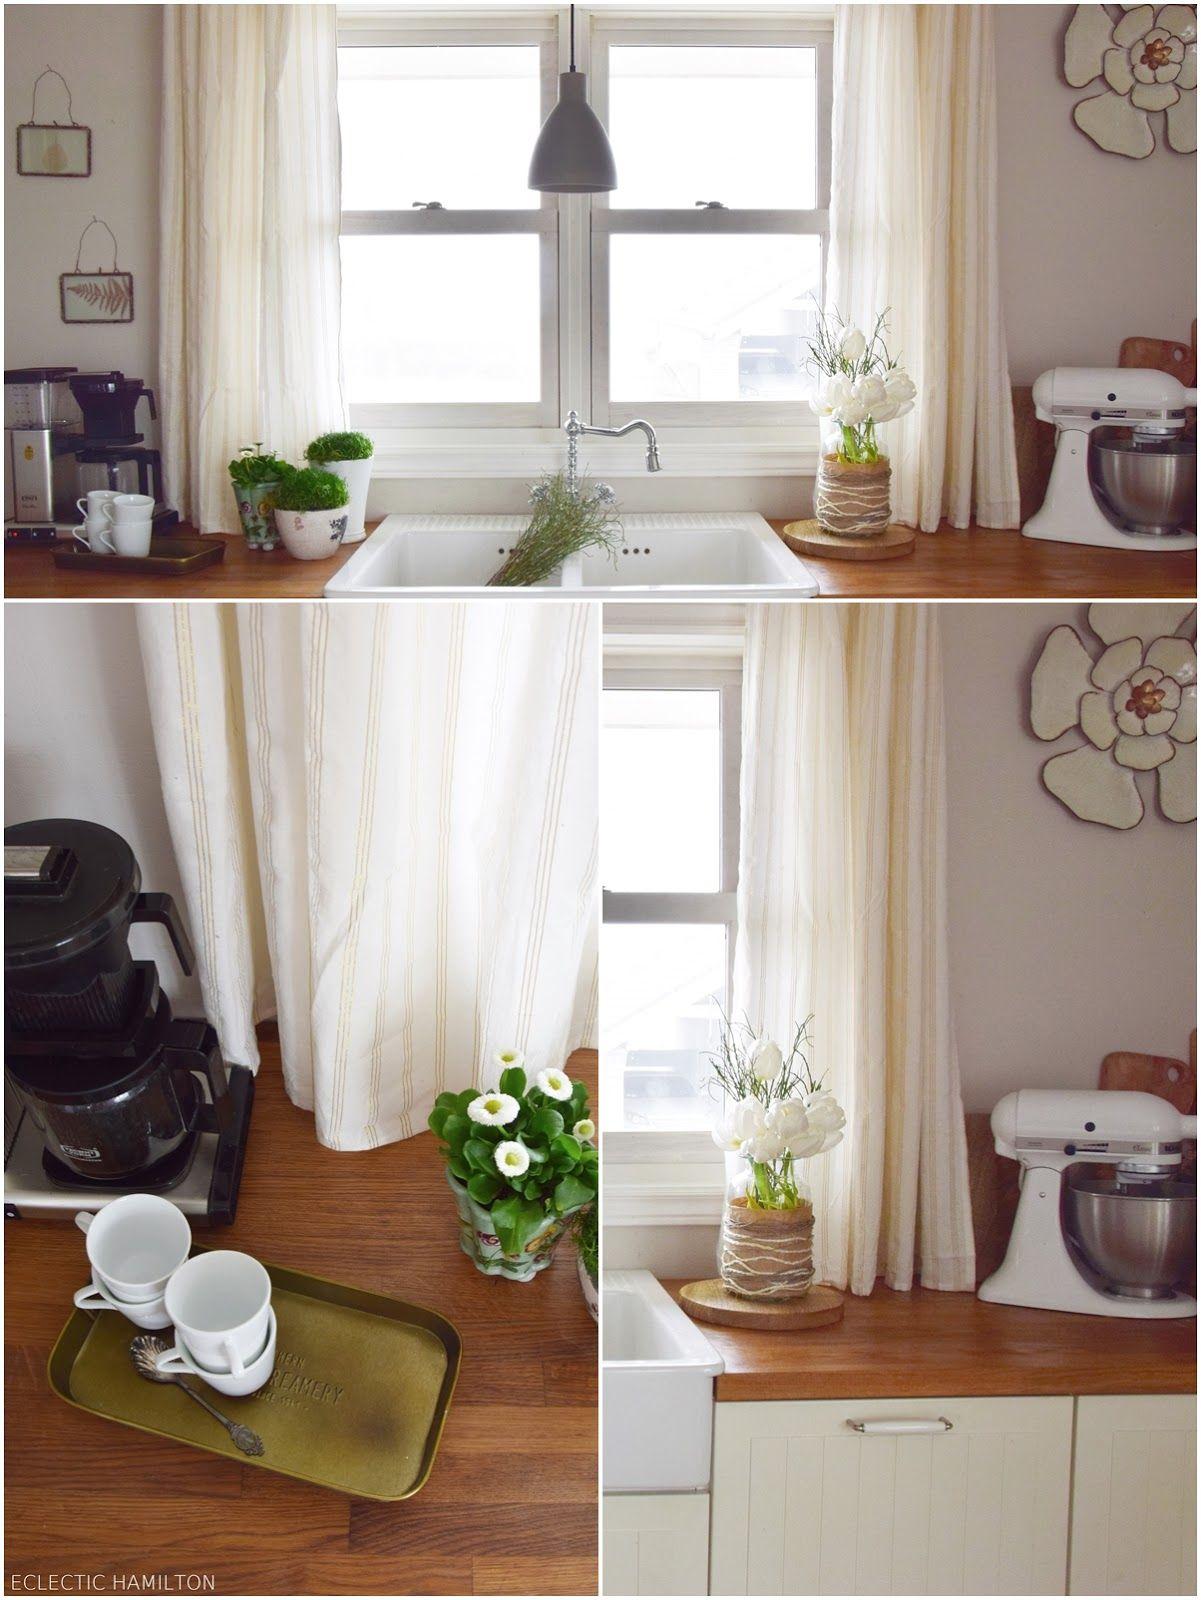 neuigkeiten aus meiner k che der fr hling ist da deko f r den fr hling. Black Bedroom Furniture Sets. Home Design Ideas